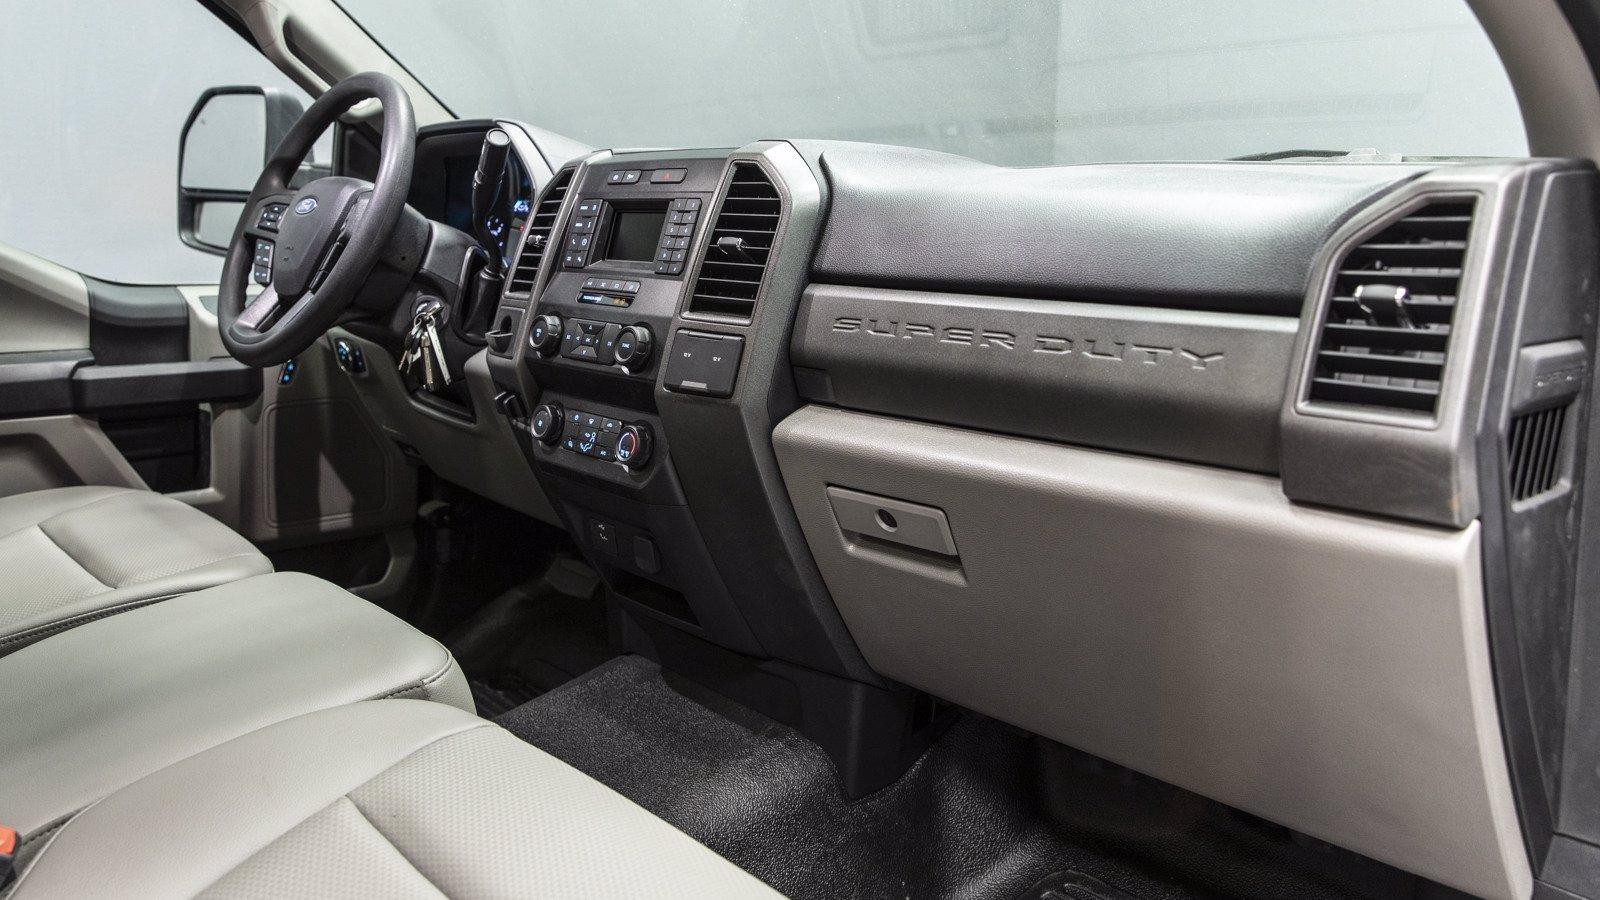 2020 Ford F-550 Regular Cab DRW 4x2, Knapheide Saw Body #04080 - photo 21